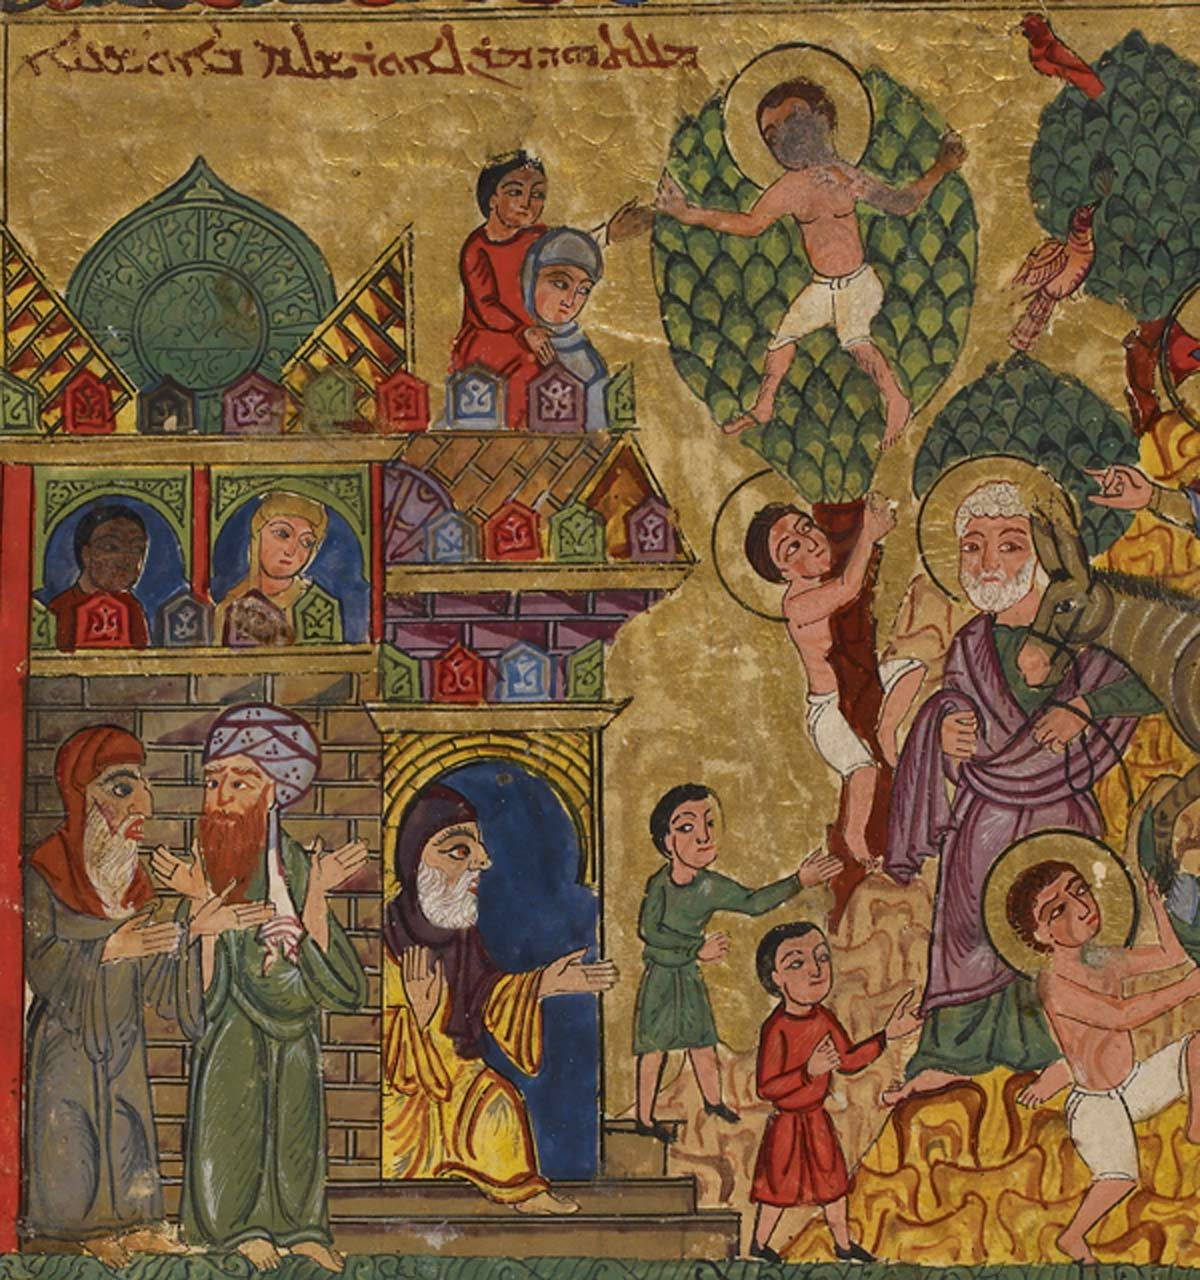 Jerusalem 1000-1400 Every People Under Heaven